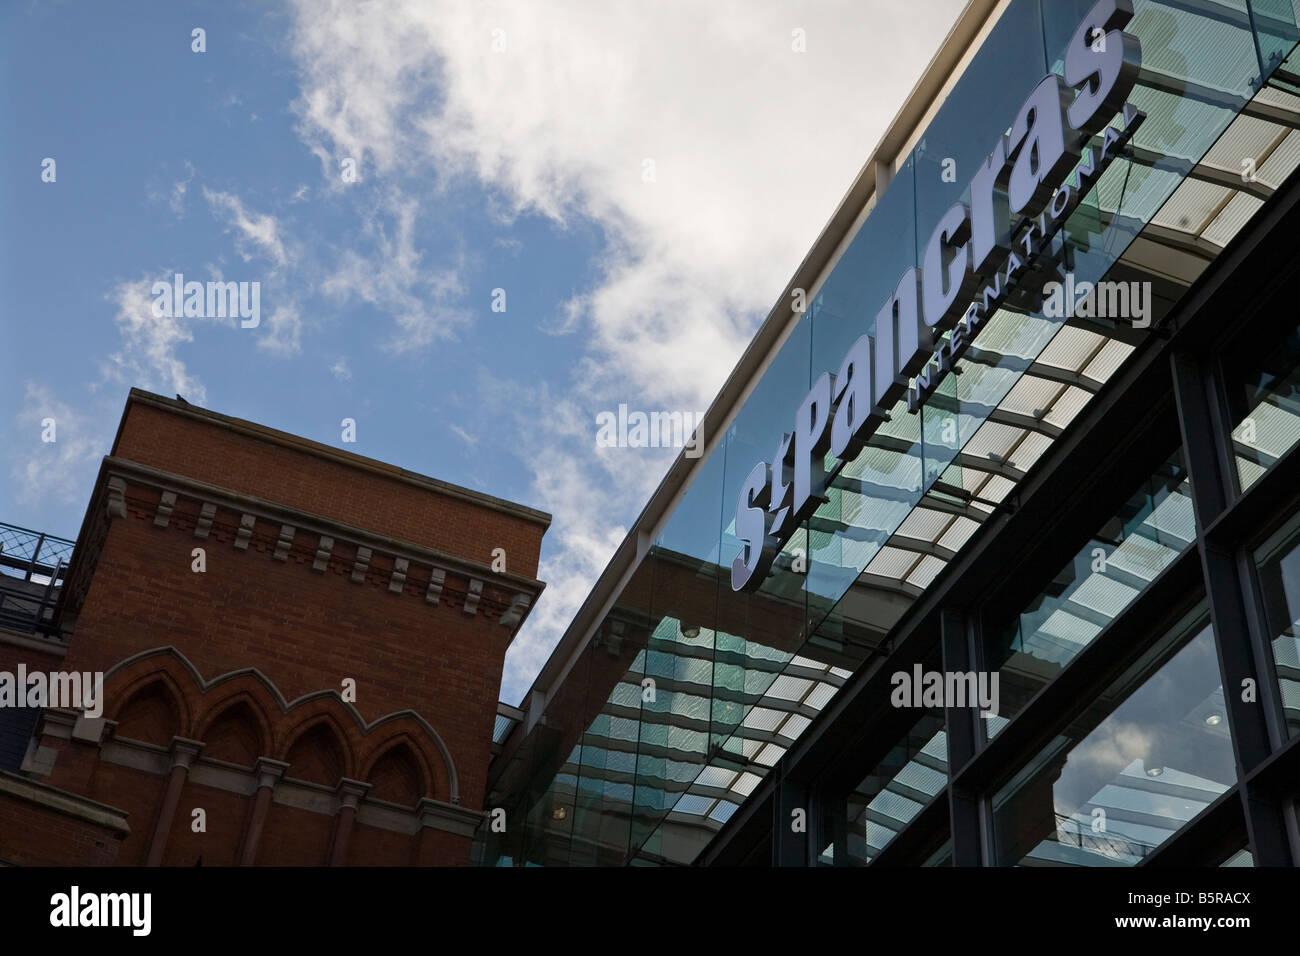 St Pancras International train station London - Stock Image